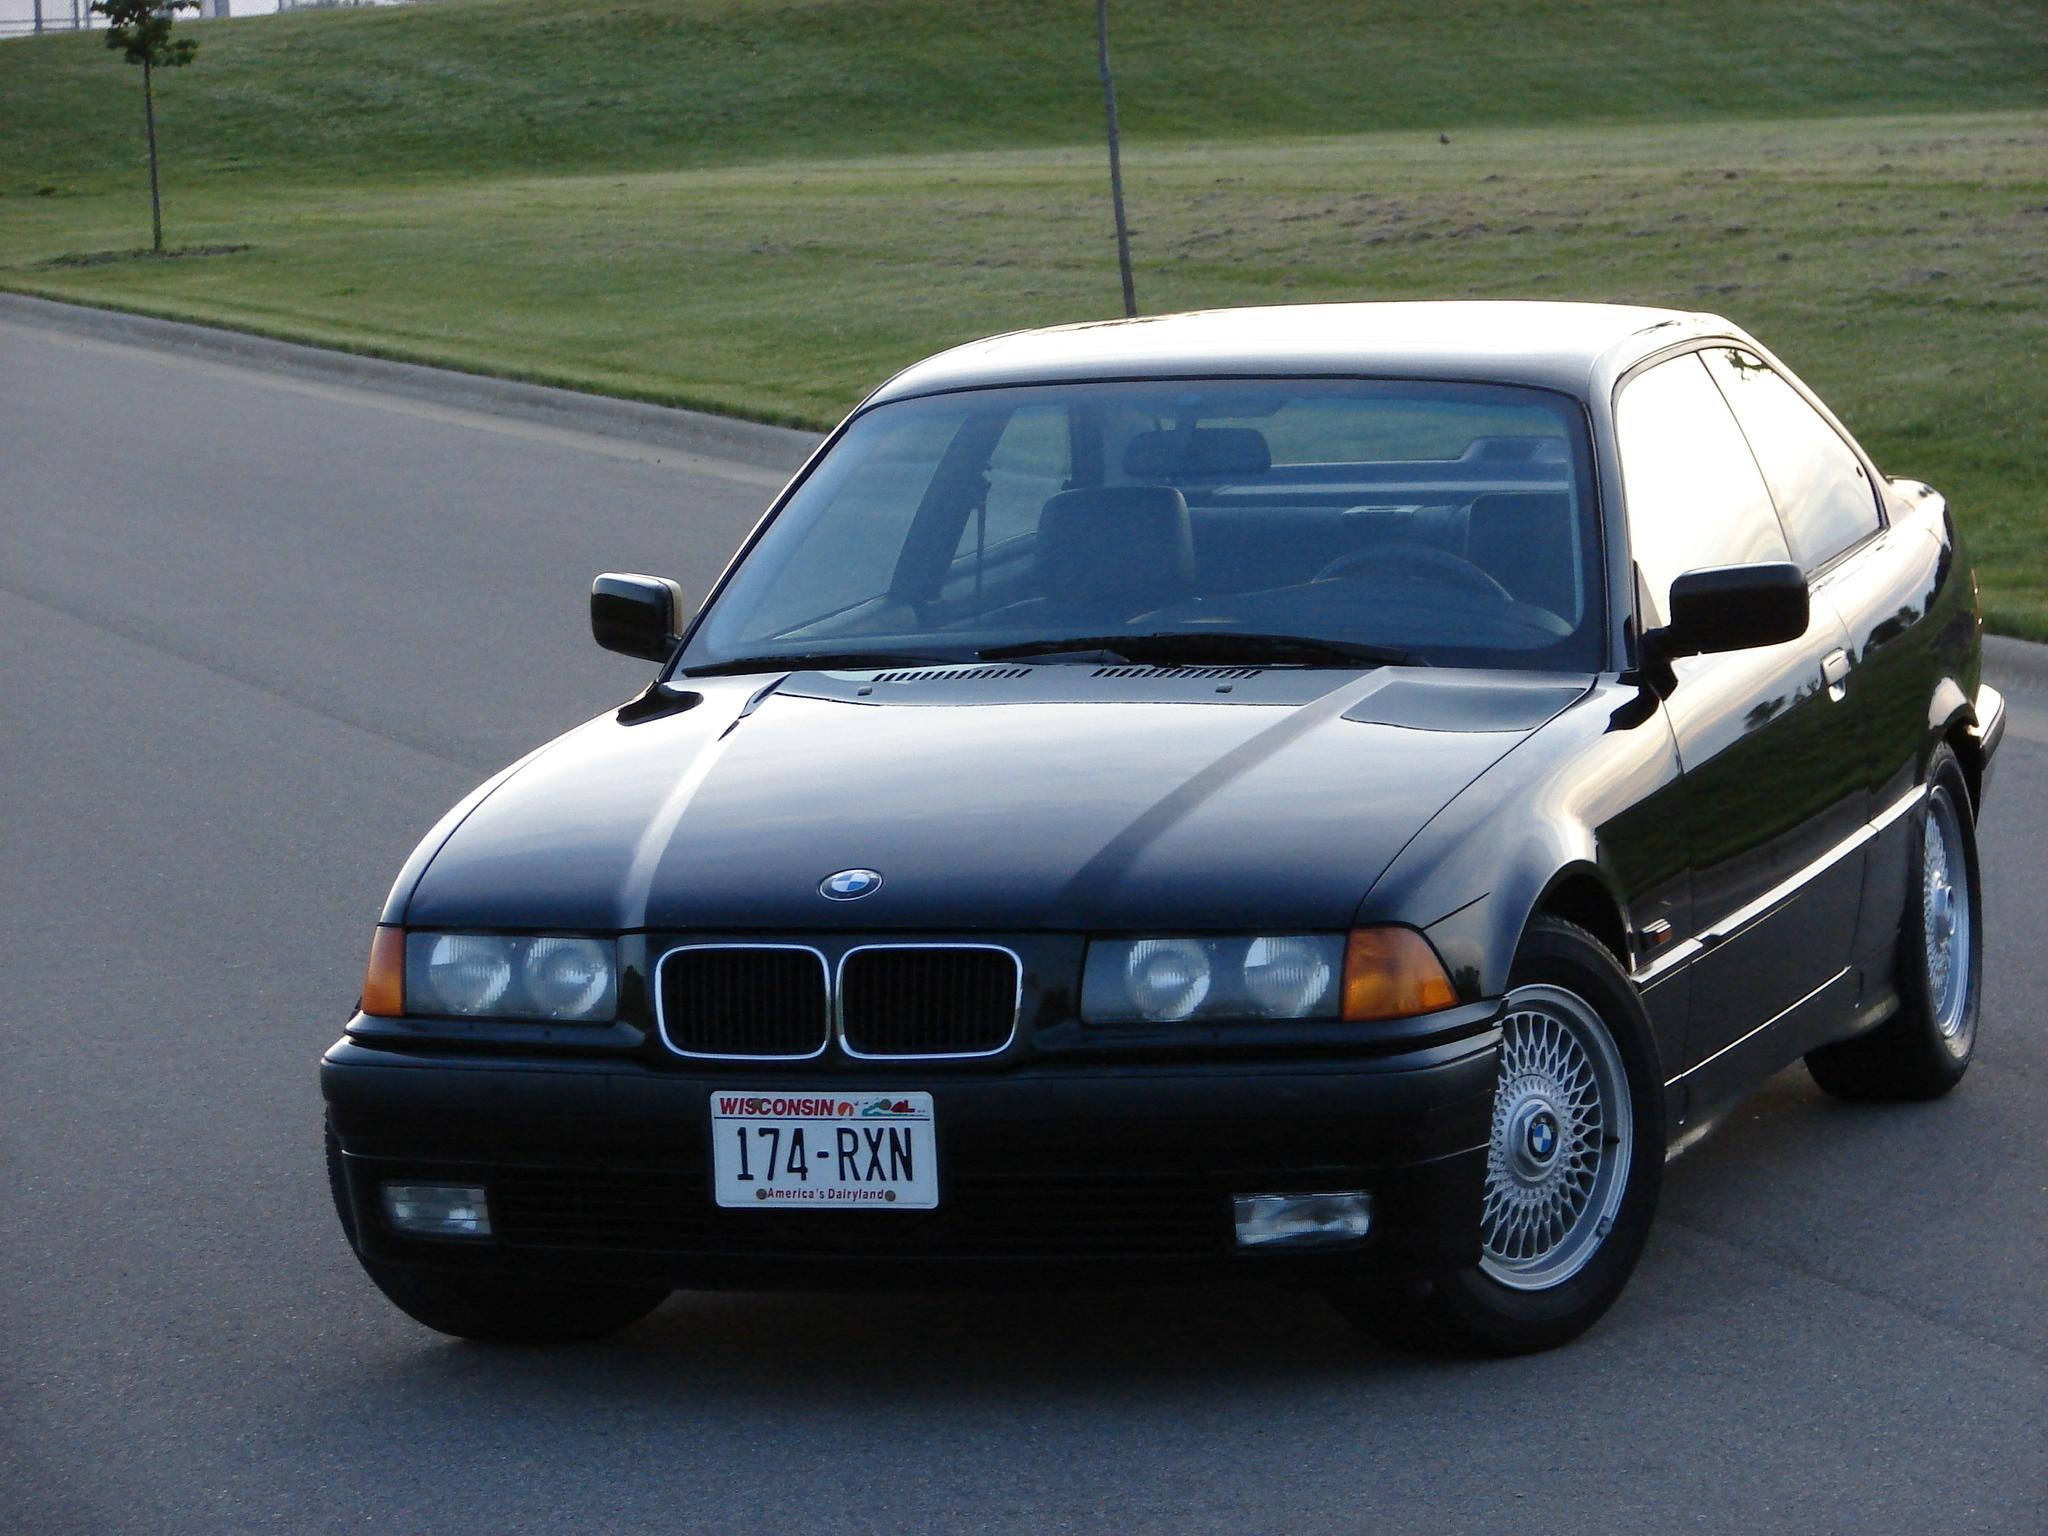 1994 BMW 5 Series – E34 Electrical Troubleshooting Manual PDF